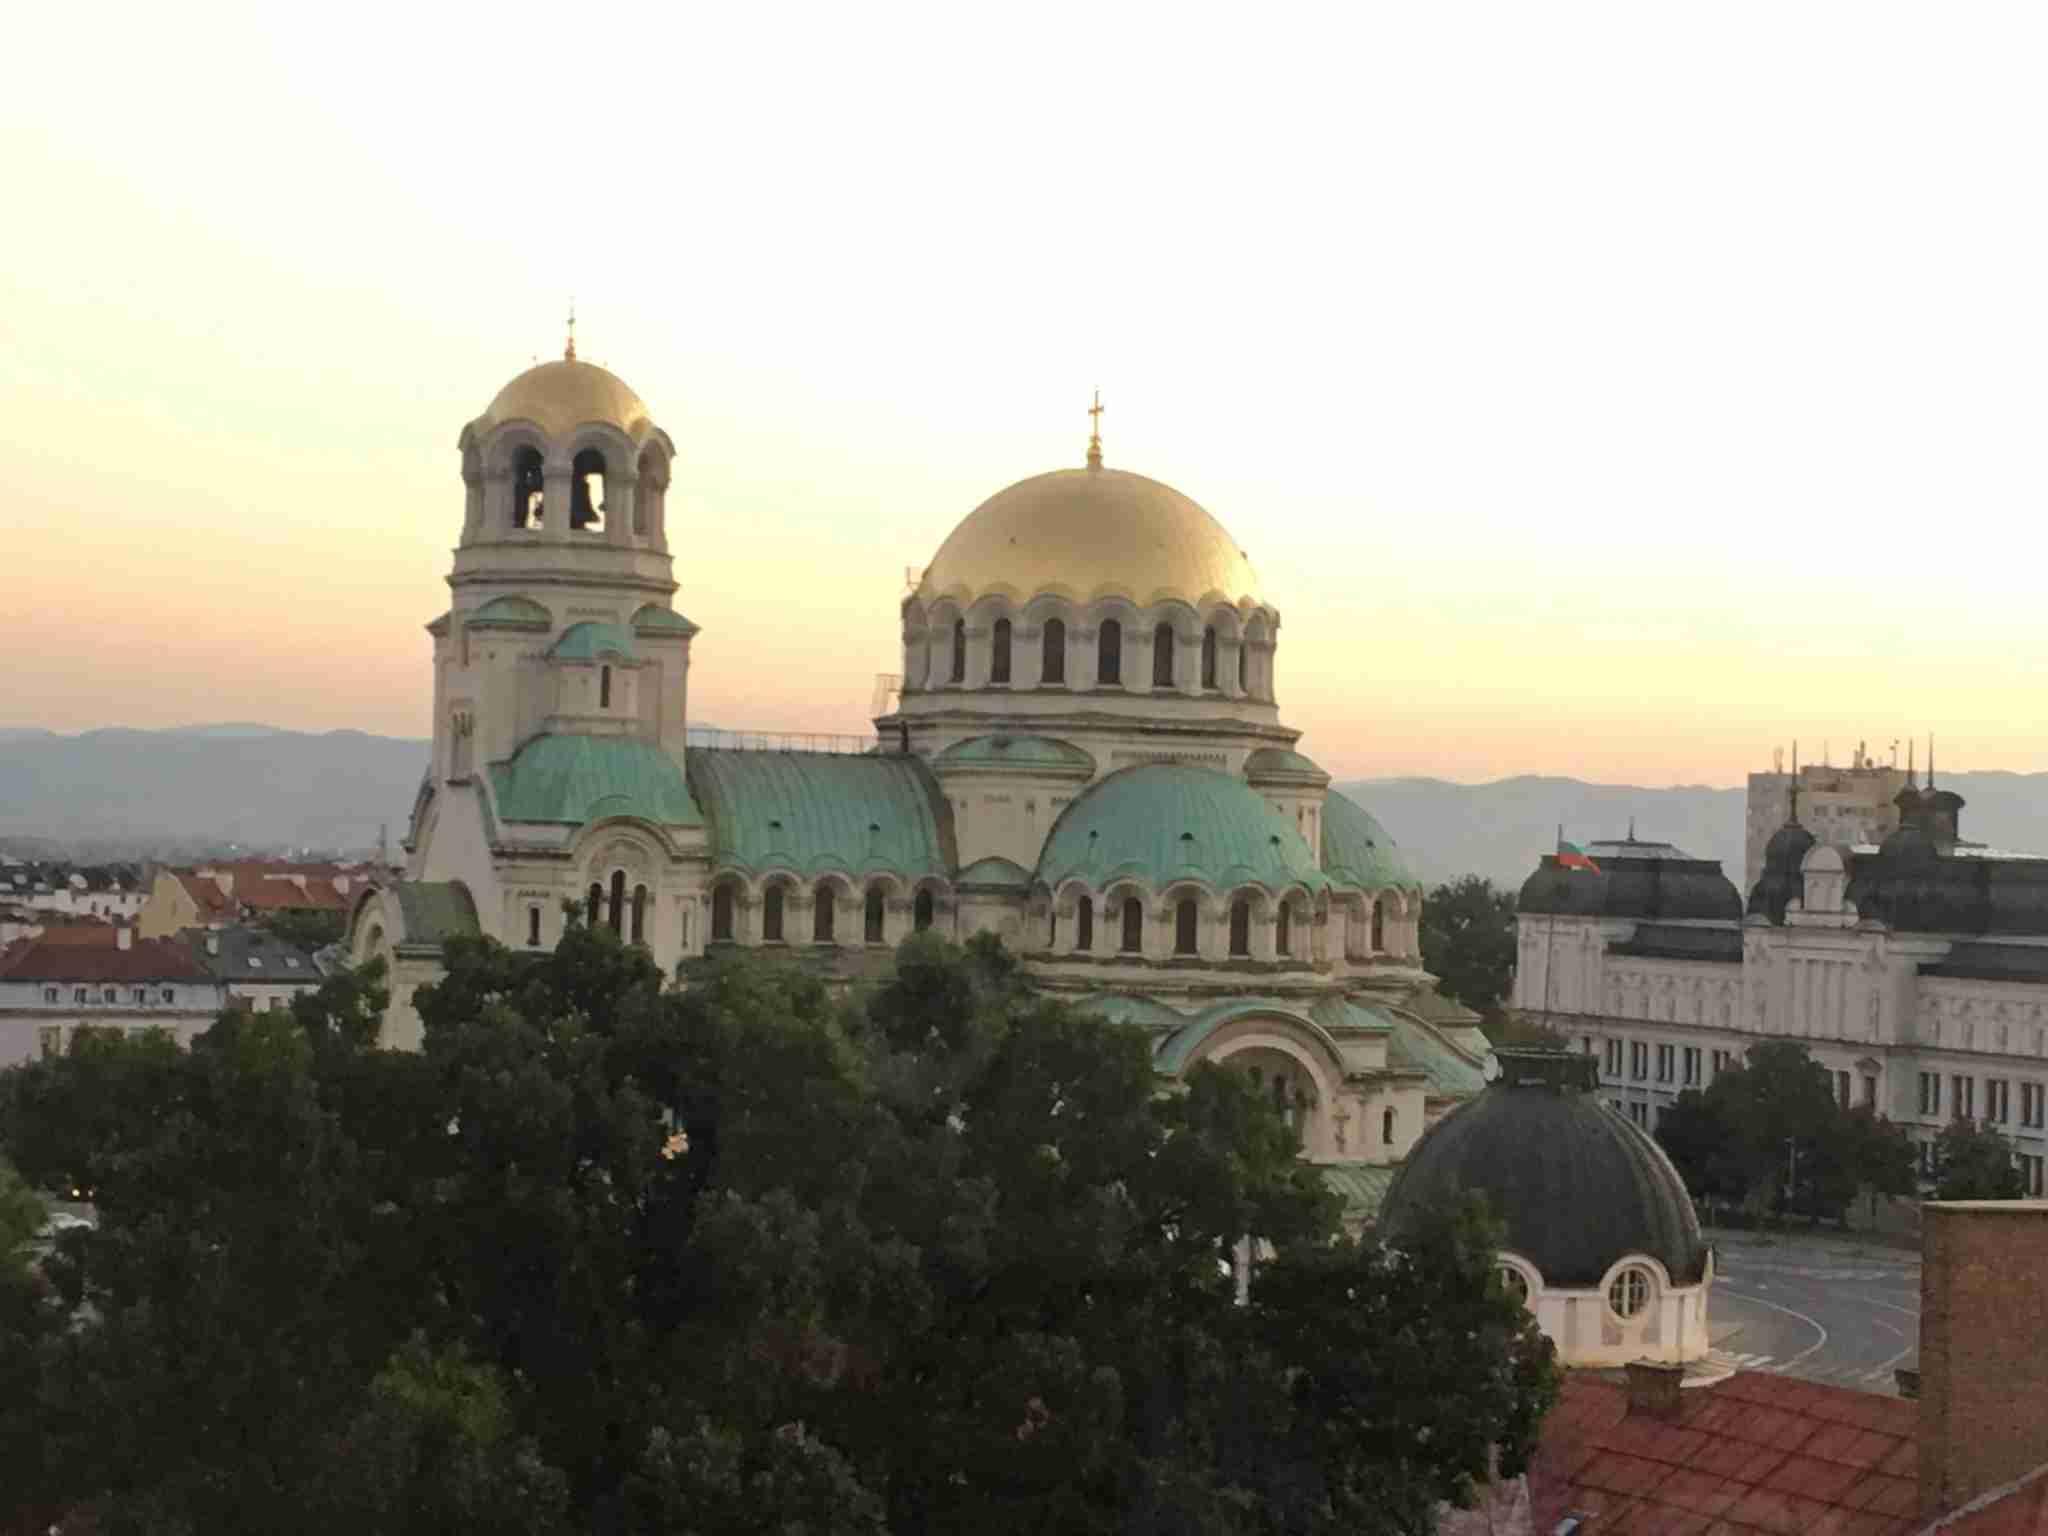 Sofia, Bulgaria September 2017. (Photo by Clint Henderson/The Points Guy)